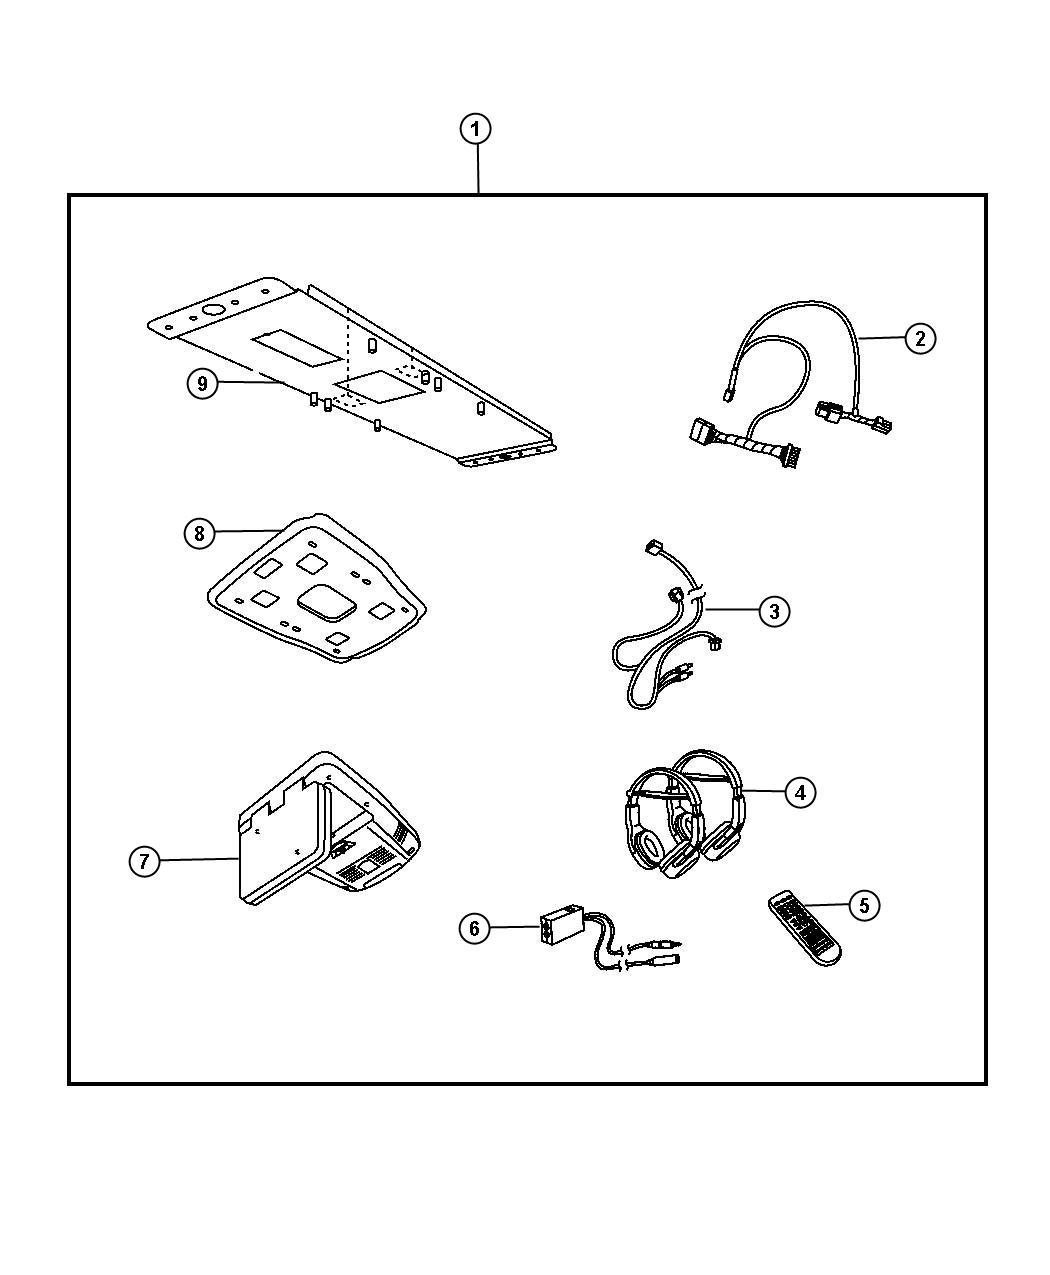 2008 dodge caliber wiring harness 5084455ac